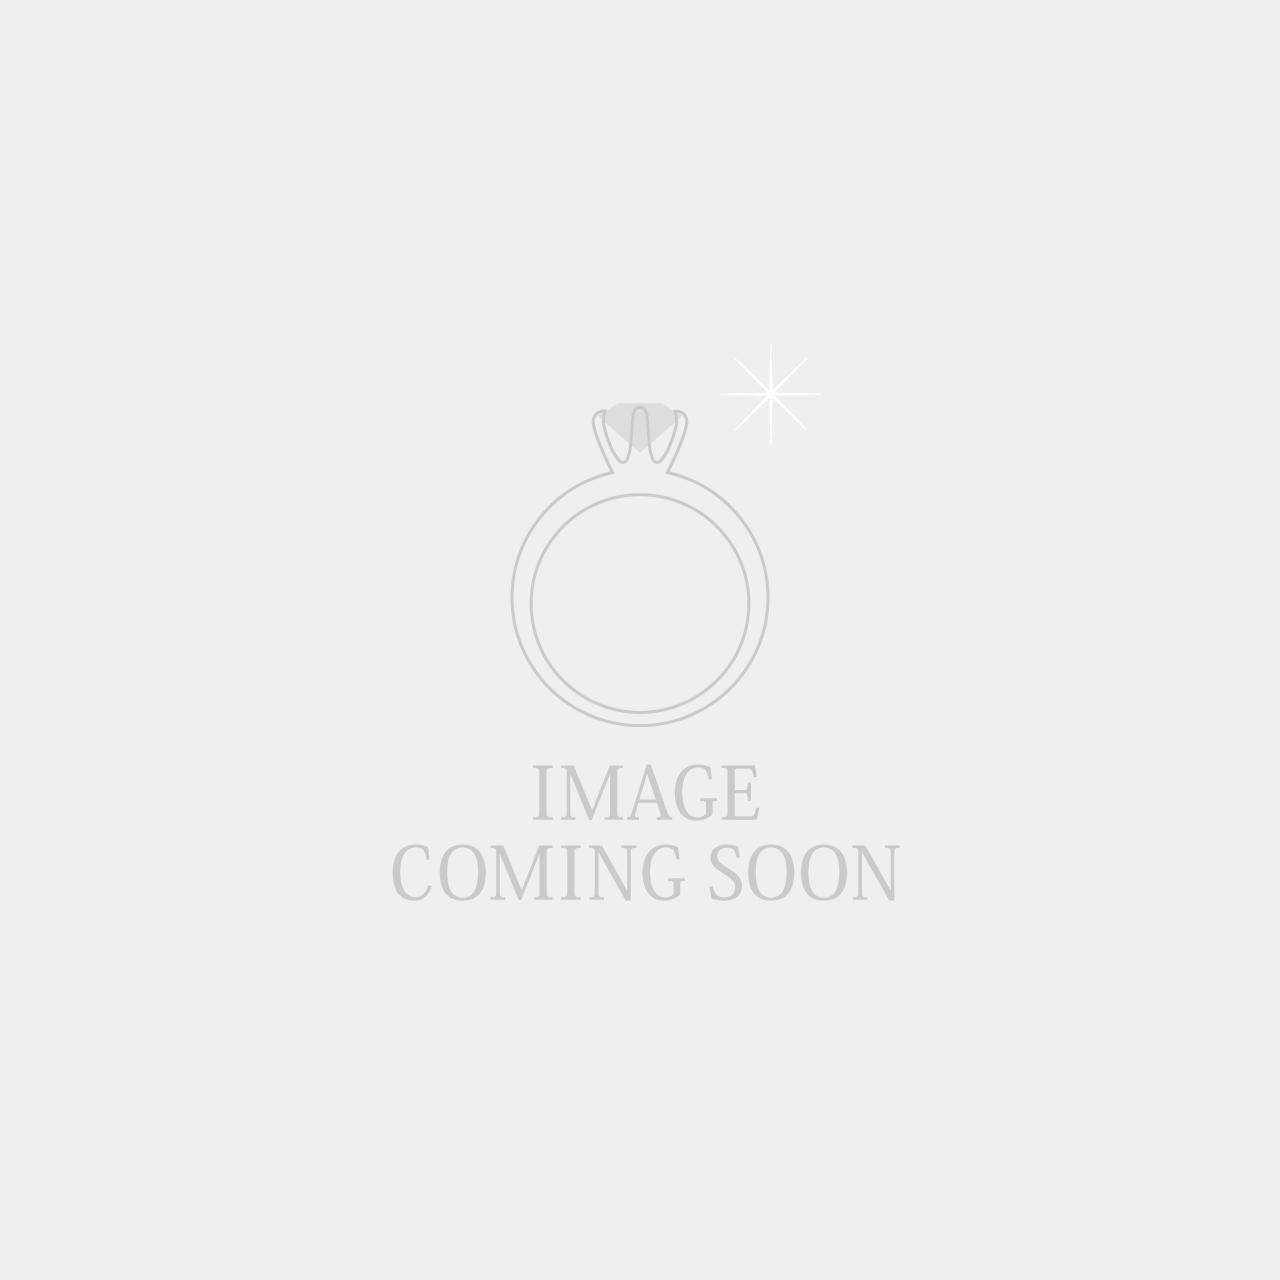 UV硬化樹脂 / 3Dモデル (ピアス) / 8分音符ロングポストピアス